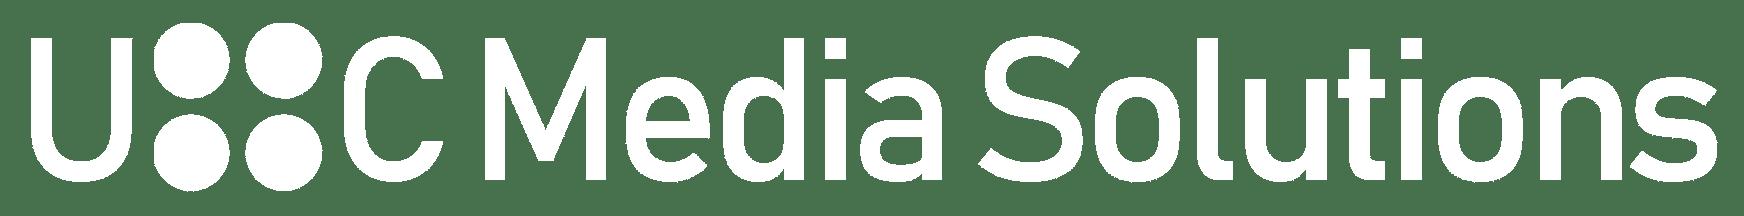 U4C Media Solutions